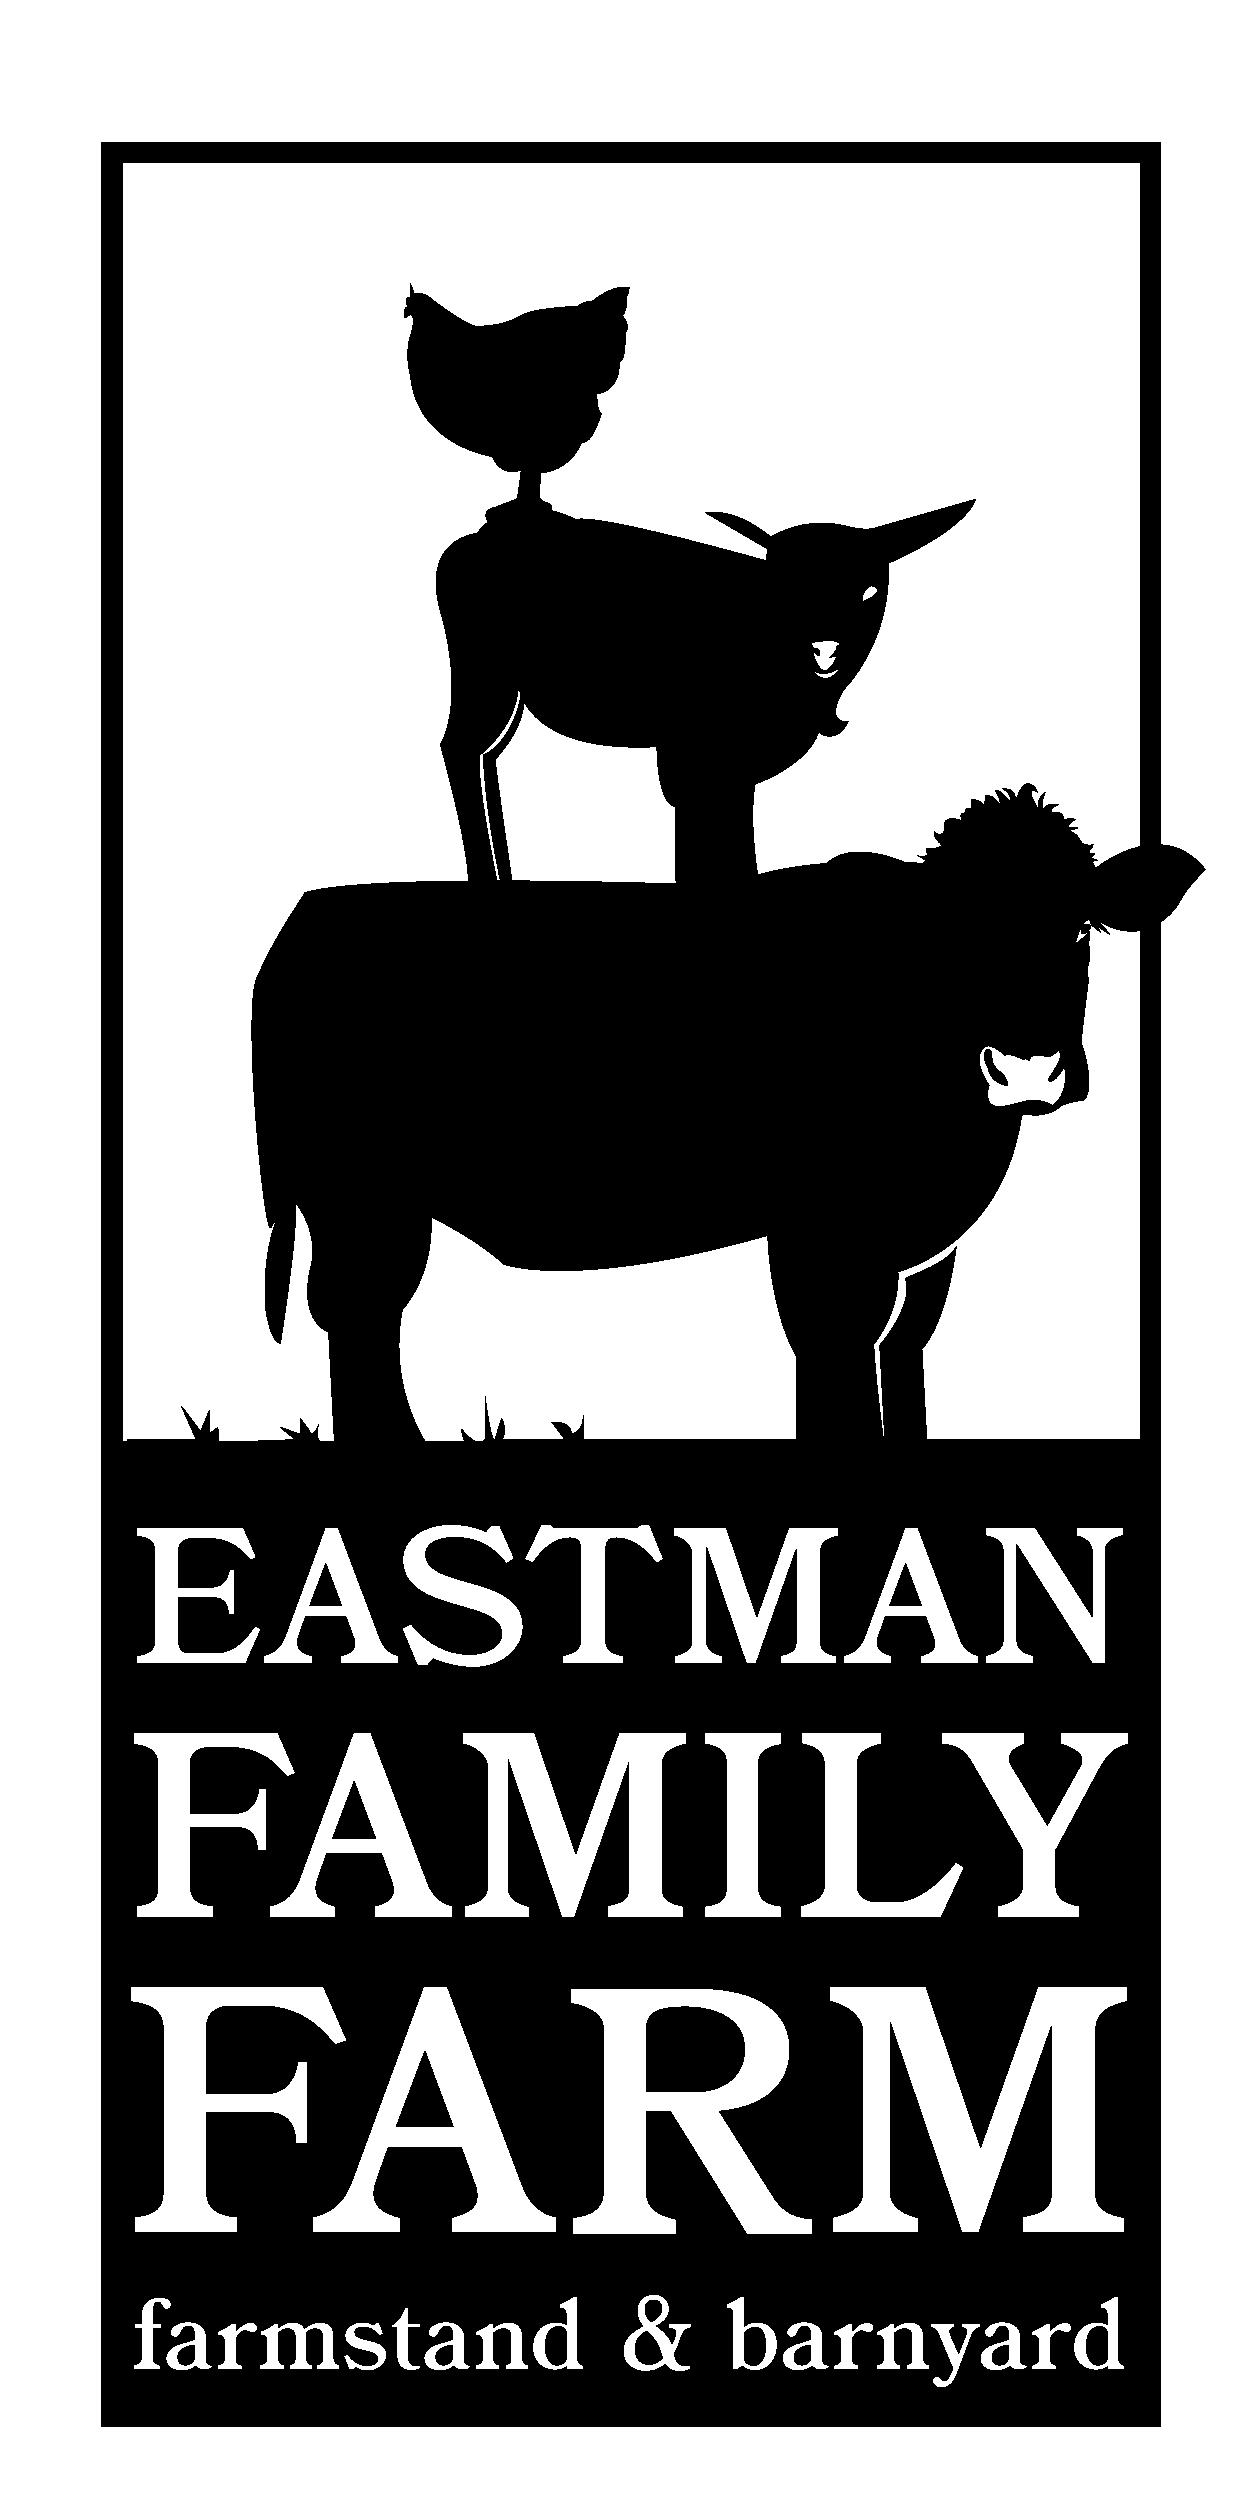 Eastman-Family-Farm-LogoB&W-03.png